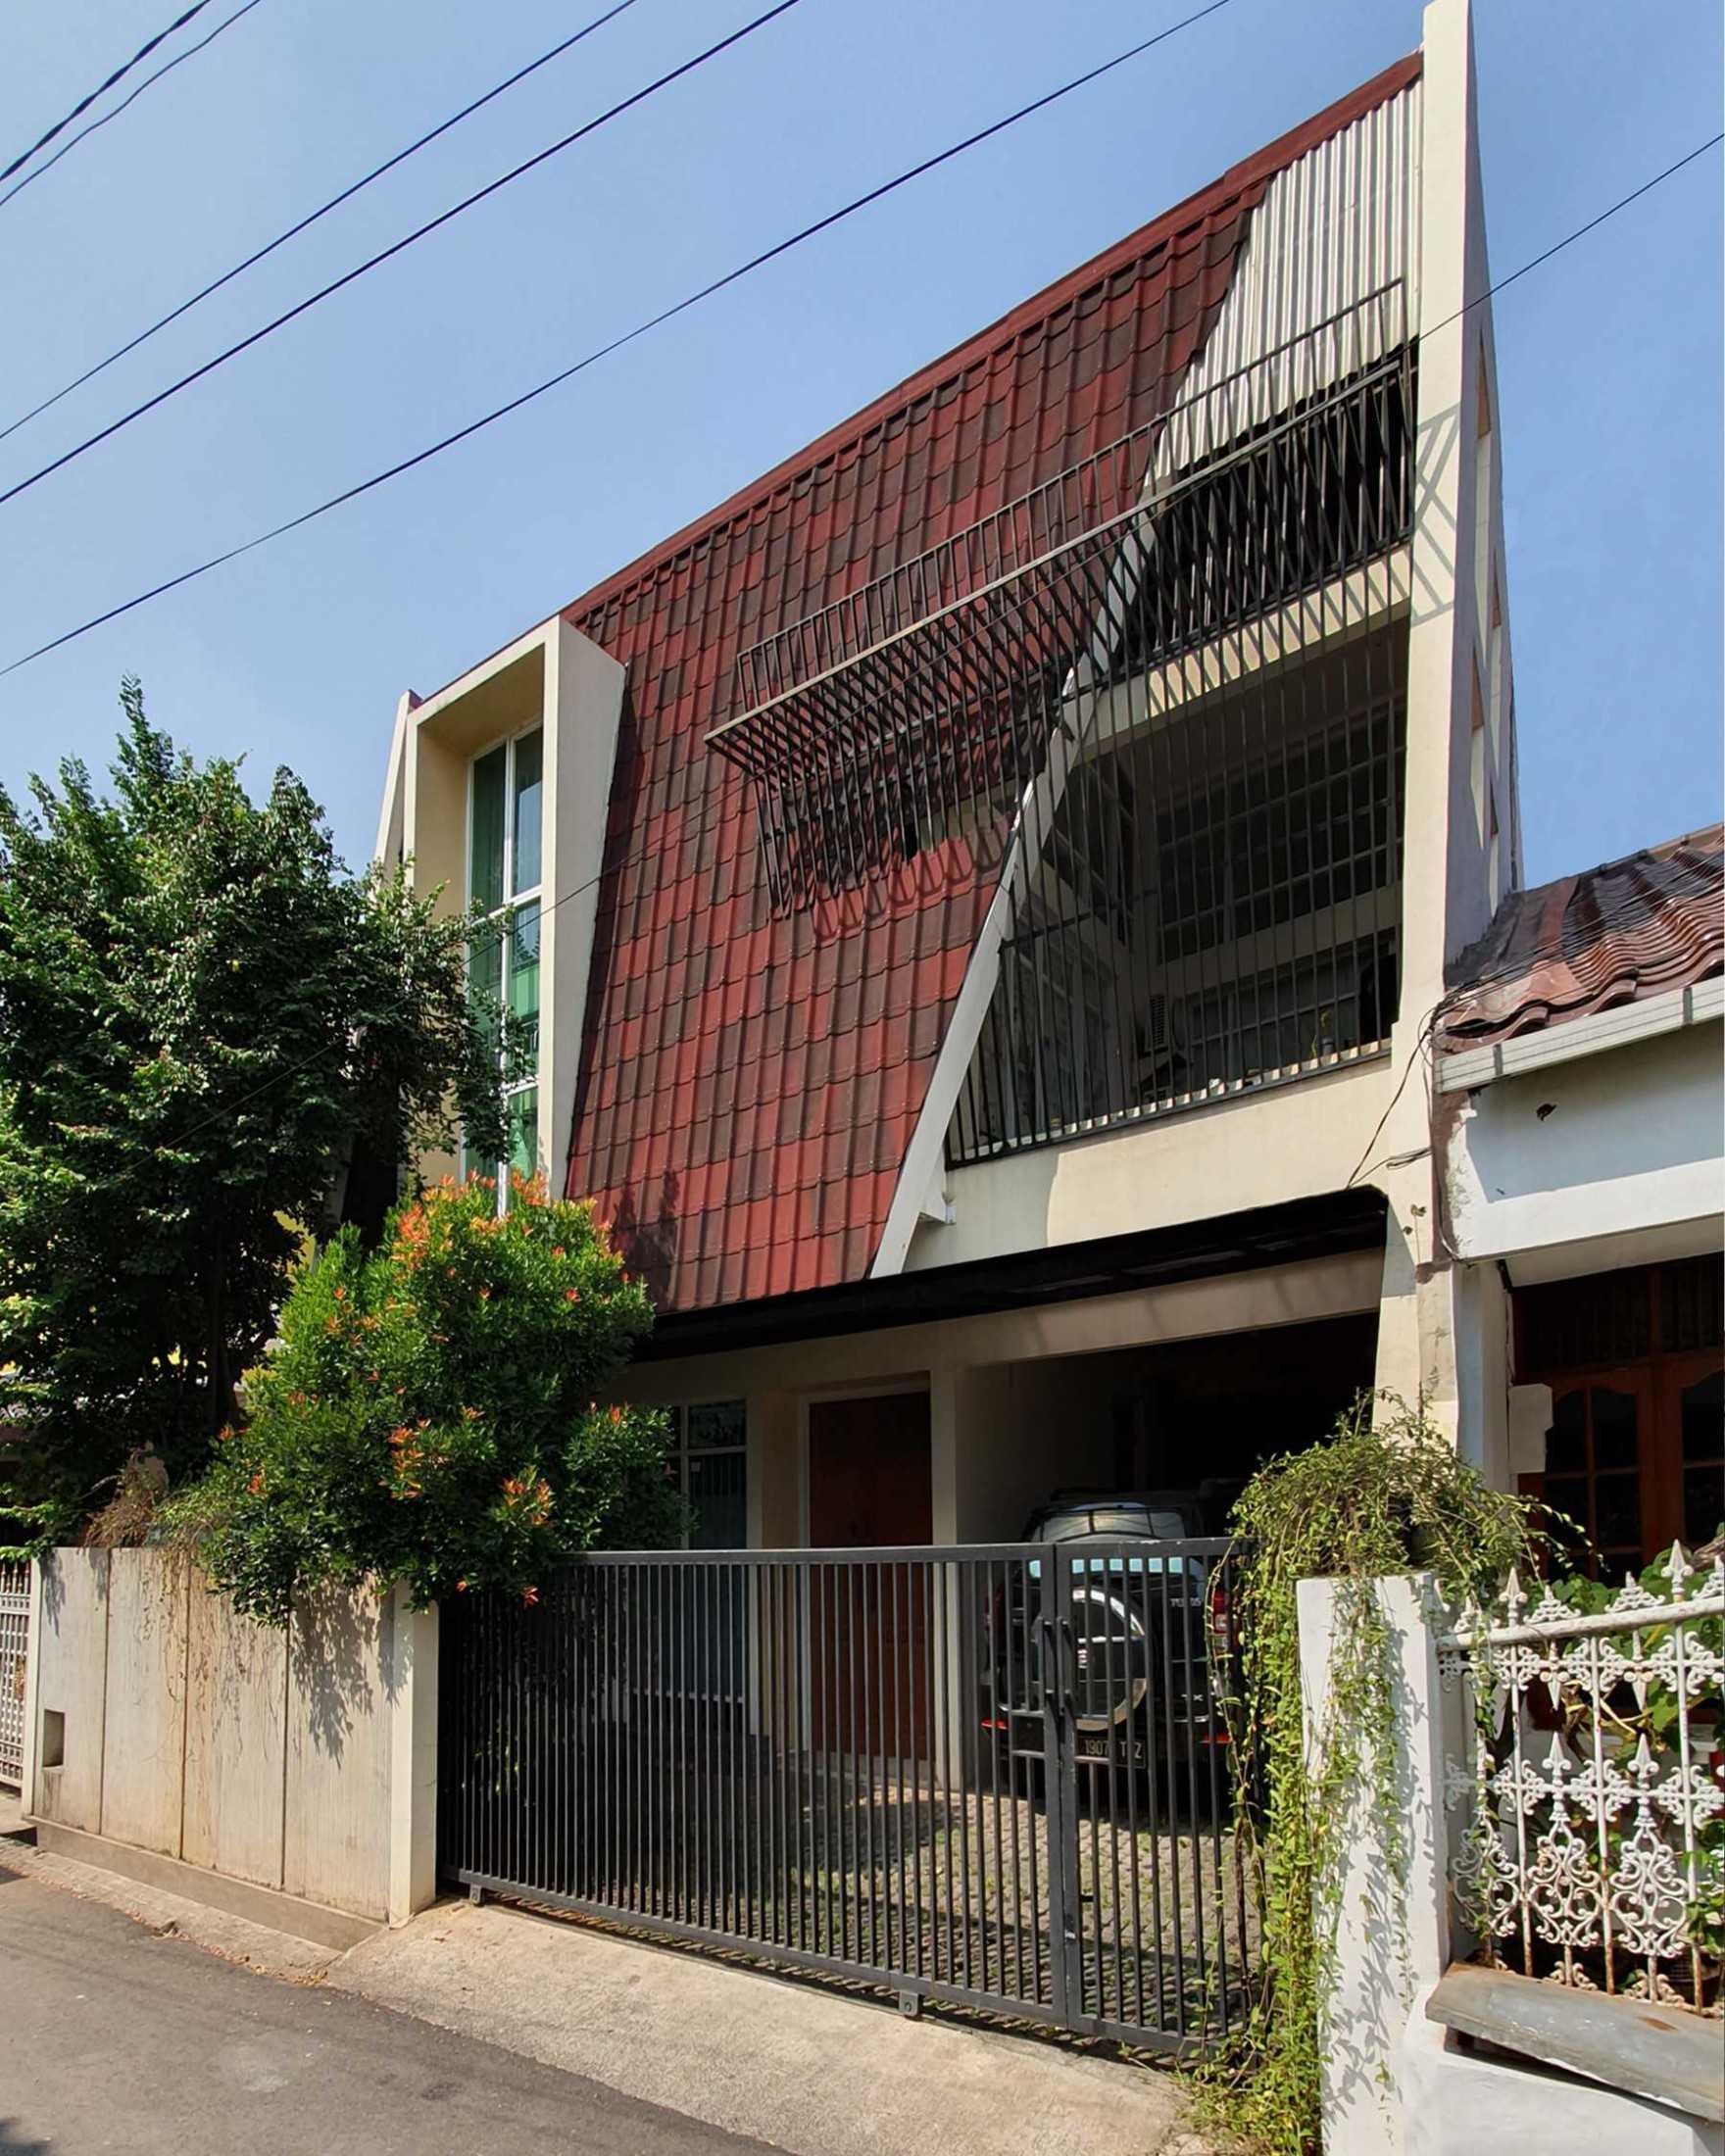 Jasa Arsitek Arsitek Pramudya di Jakarta Timur